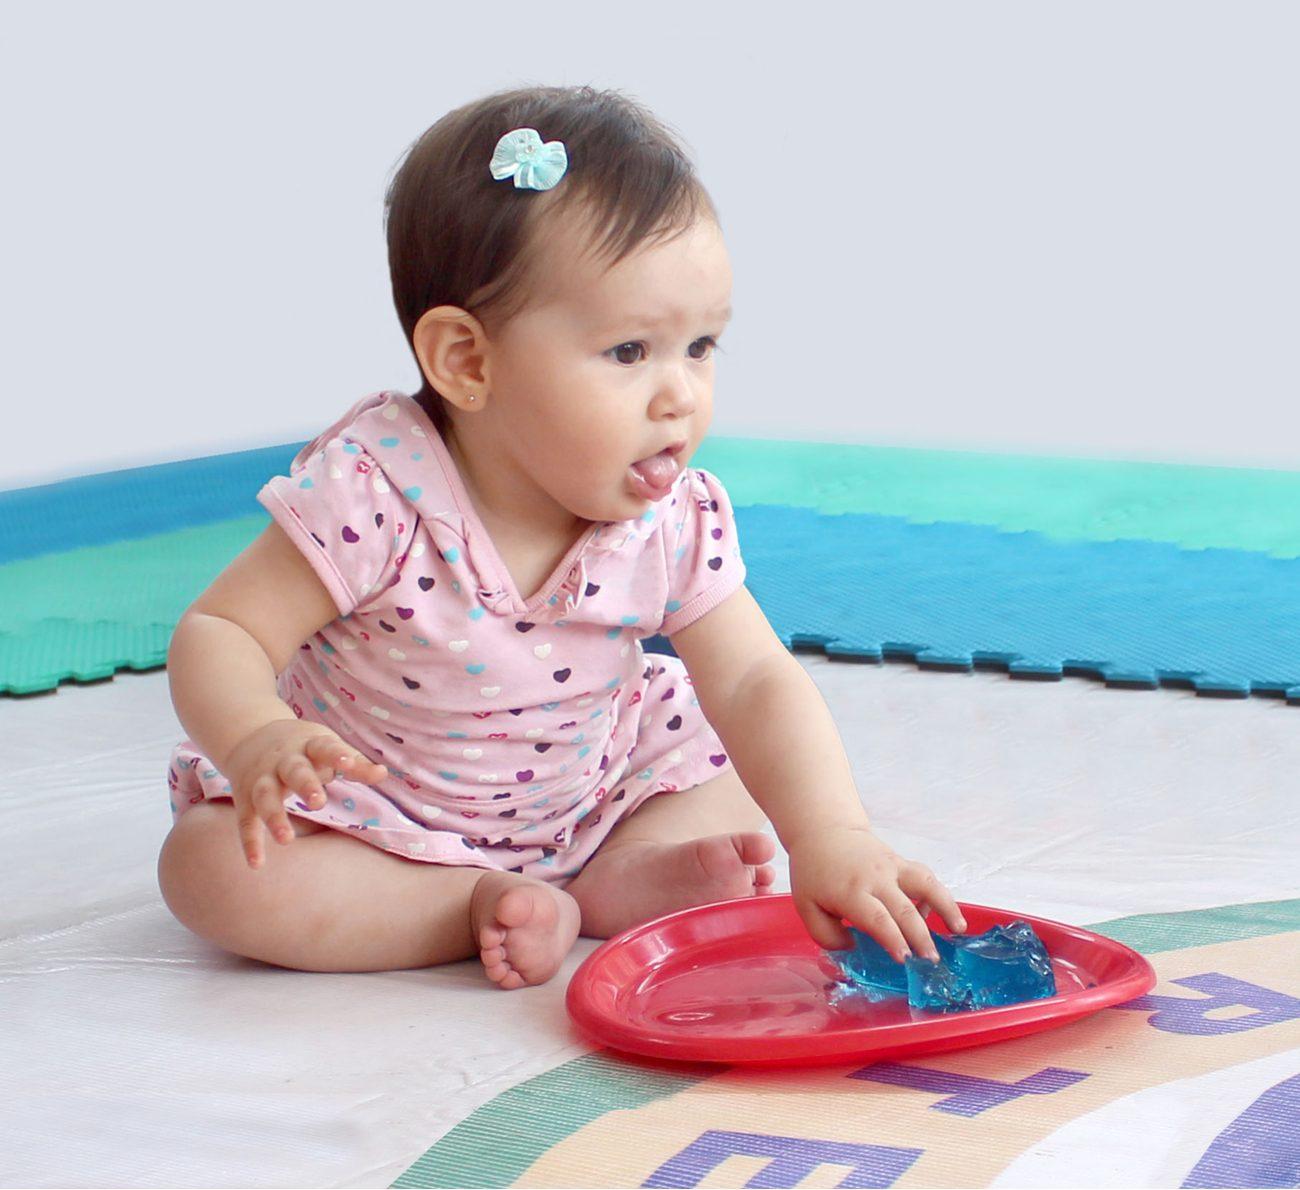 bebê pode comer gelatina